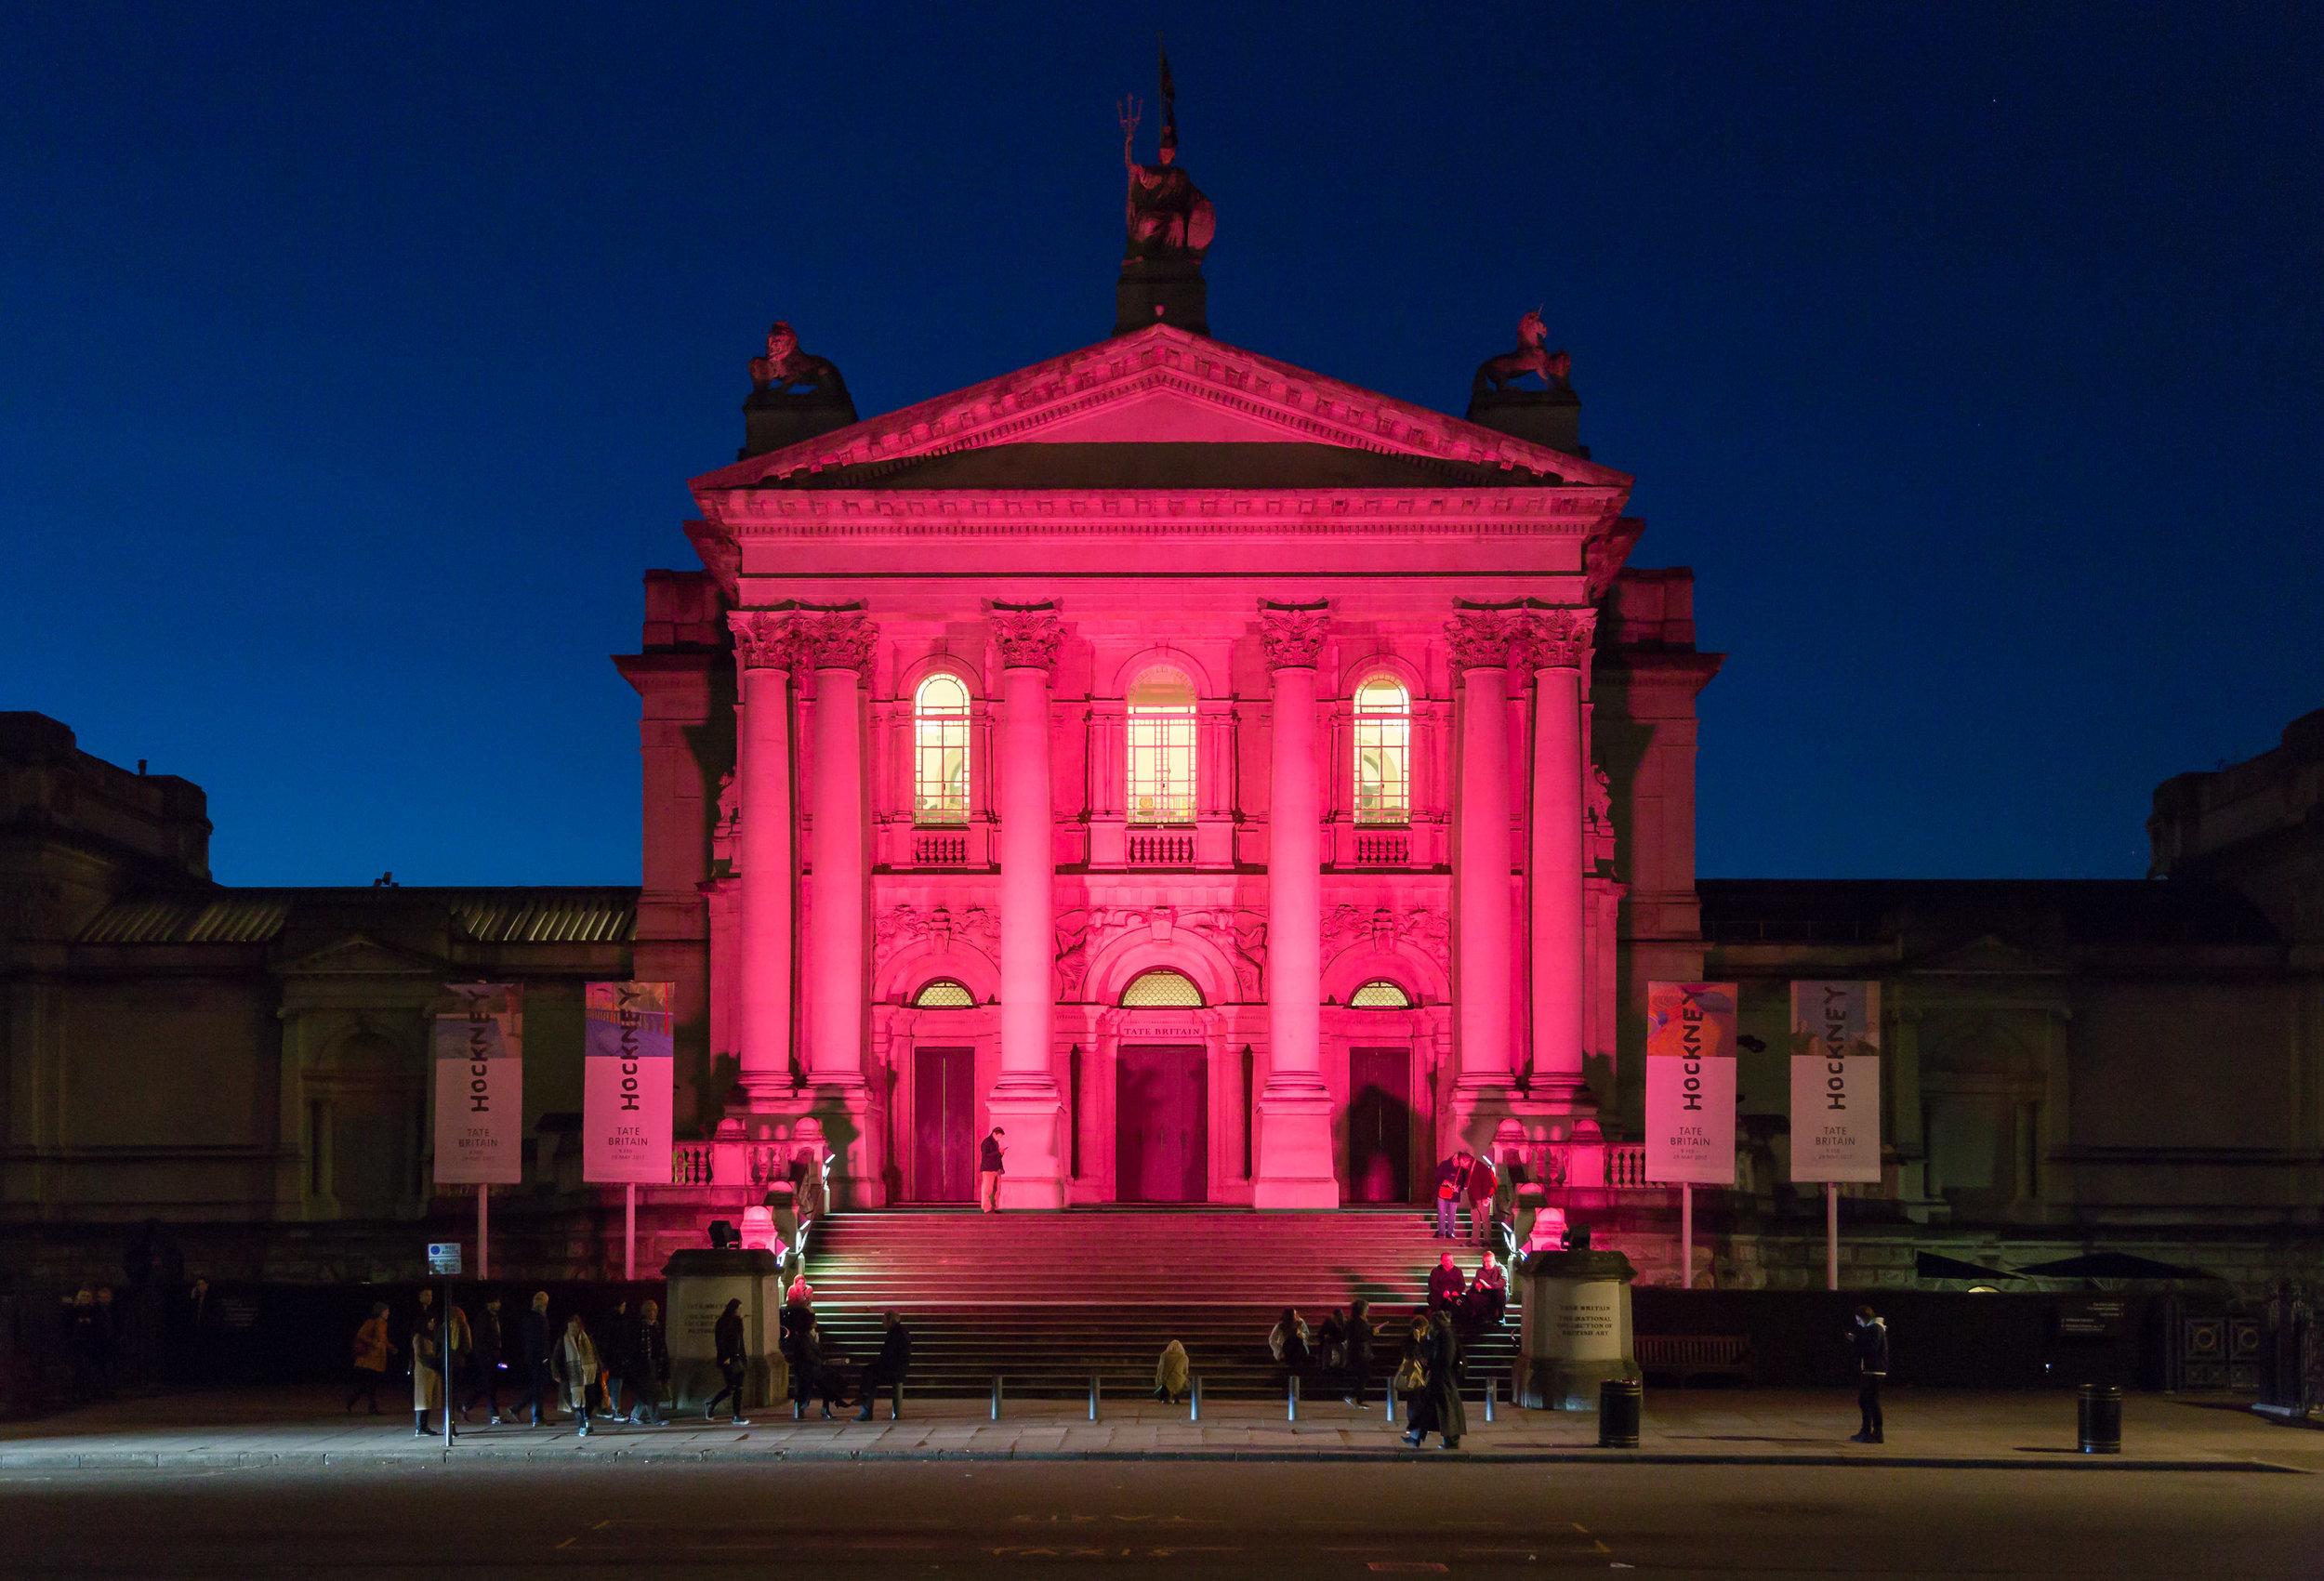 Tate Britain at Blue Hour